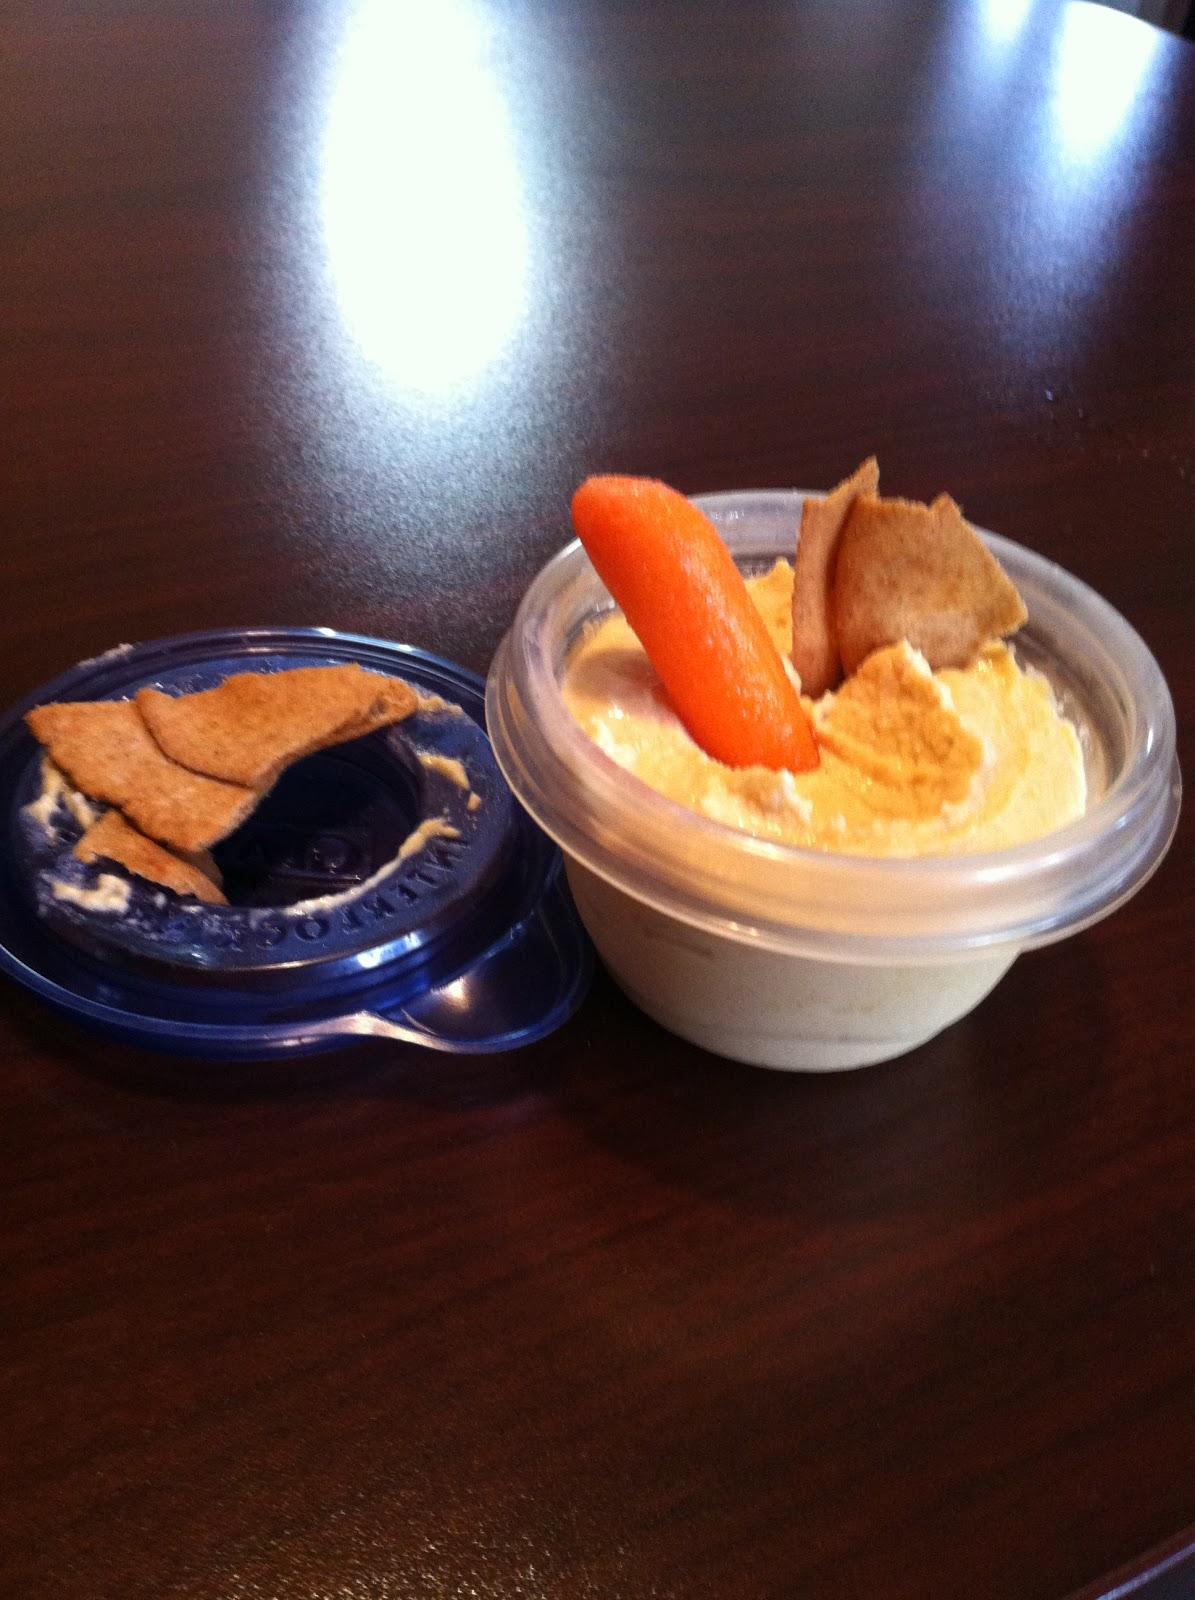 Carrots and hummus